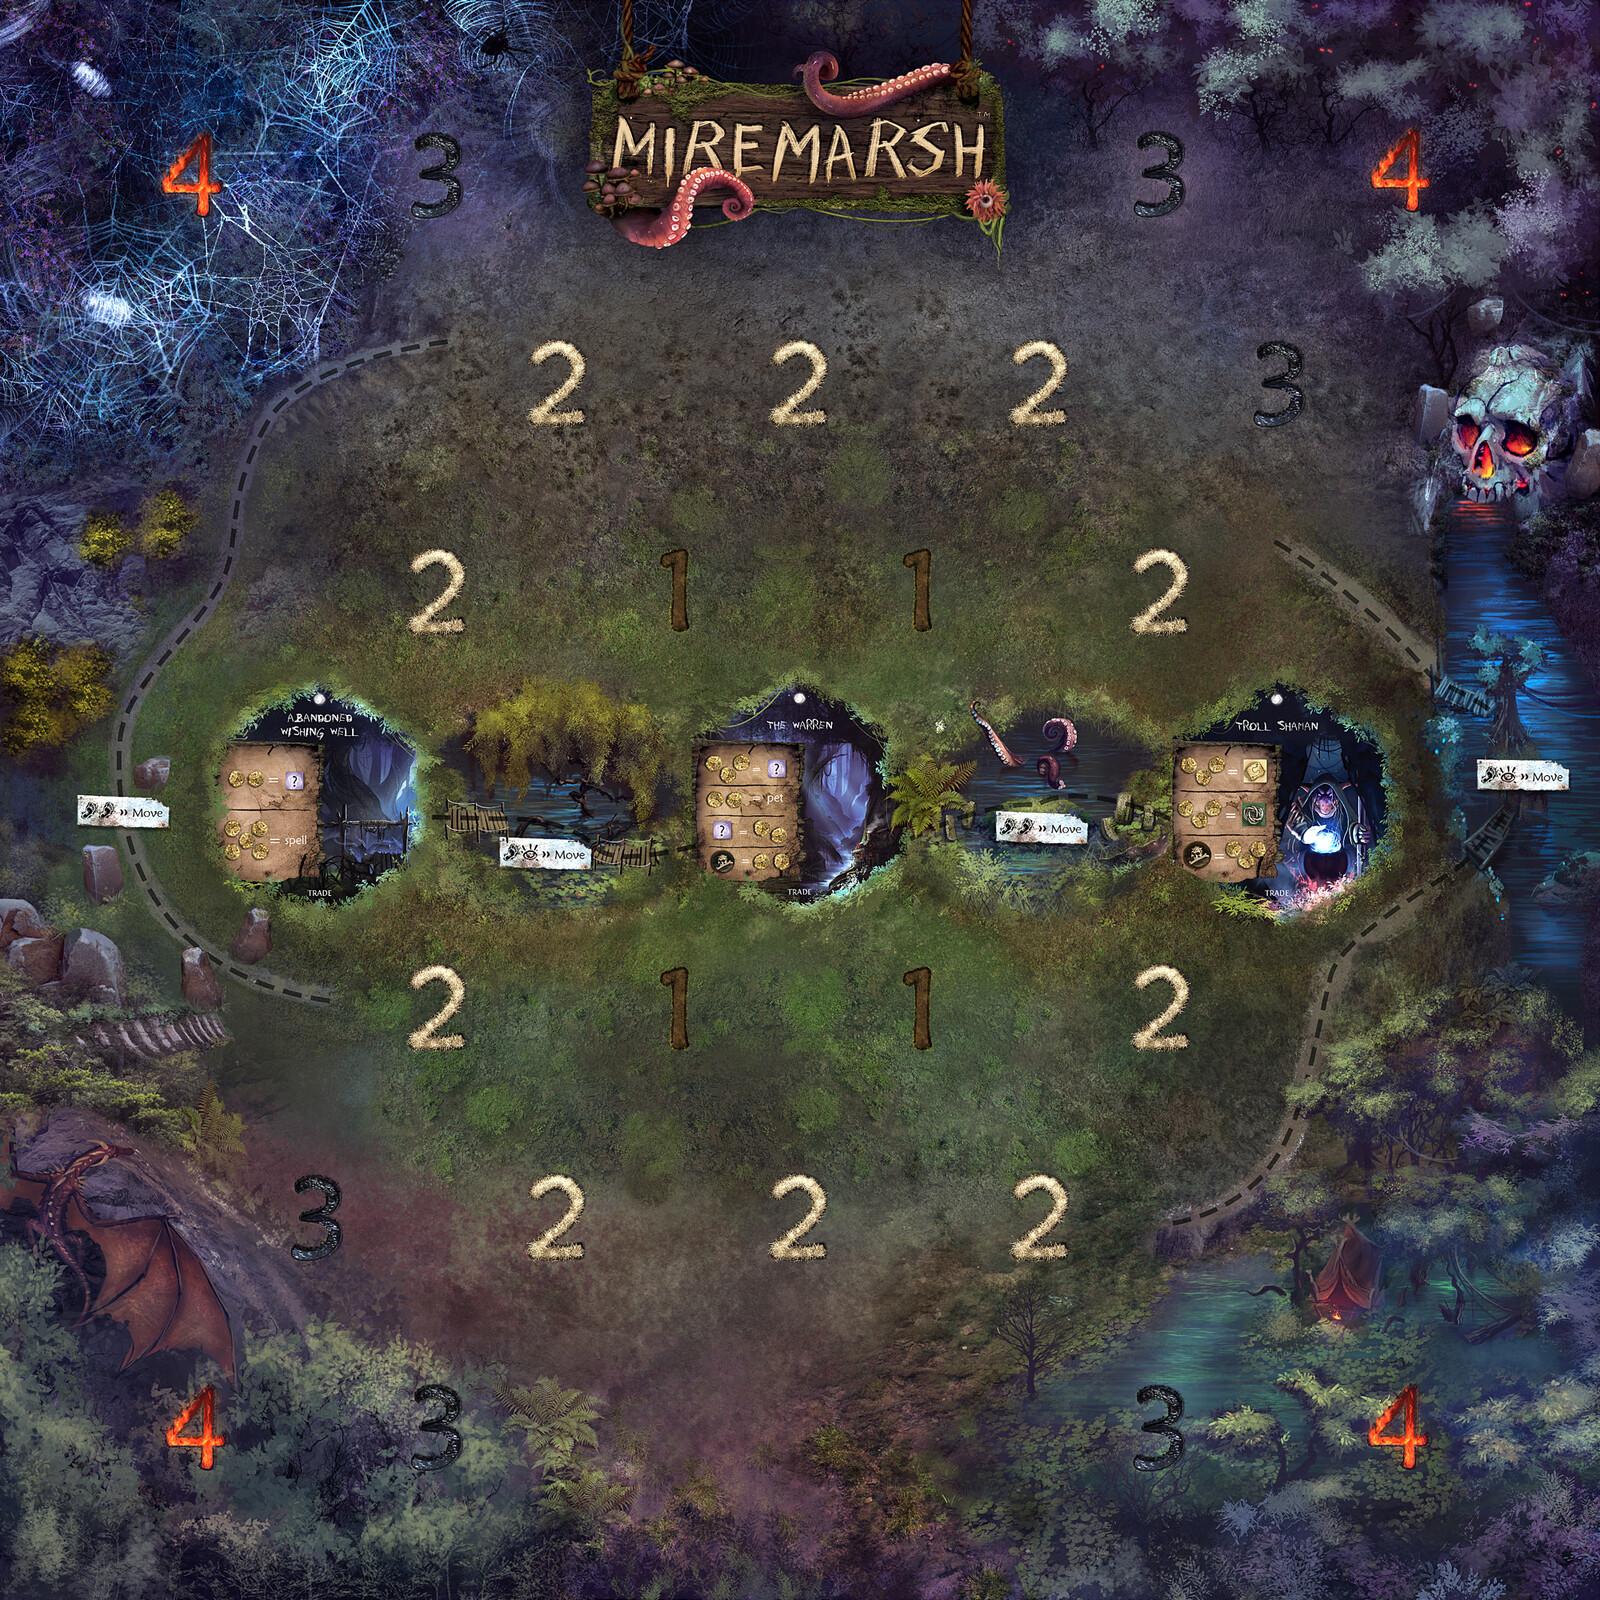 Miremarsh Game Board Design